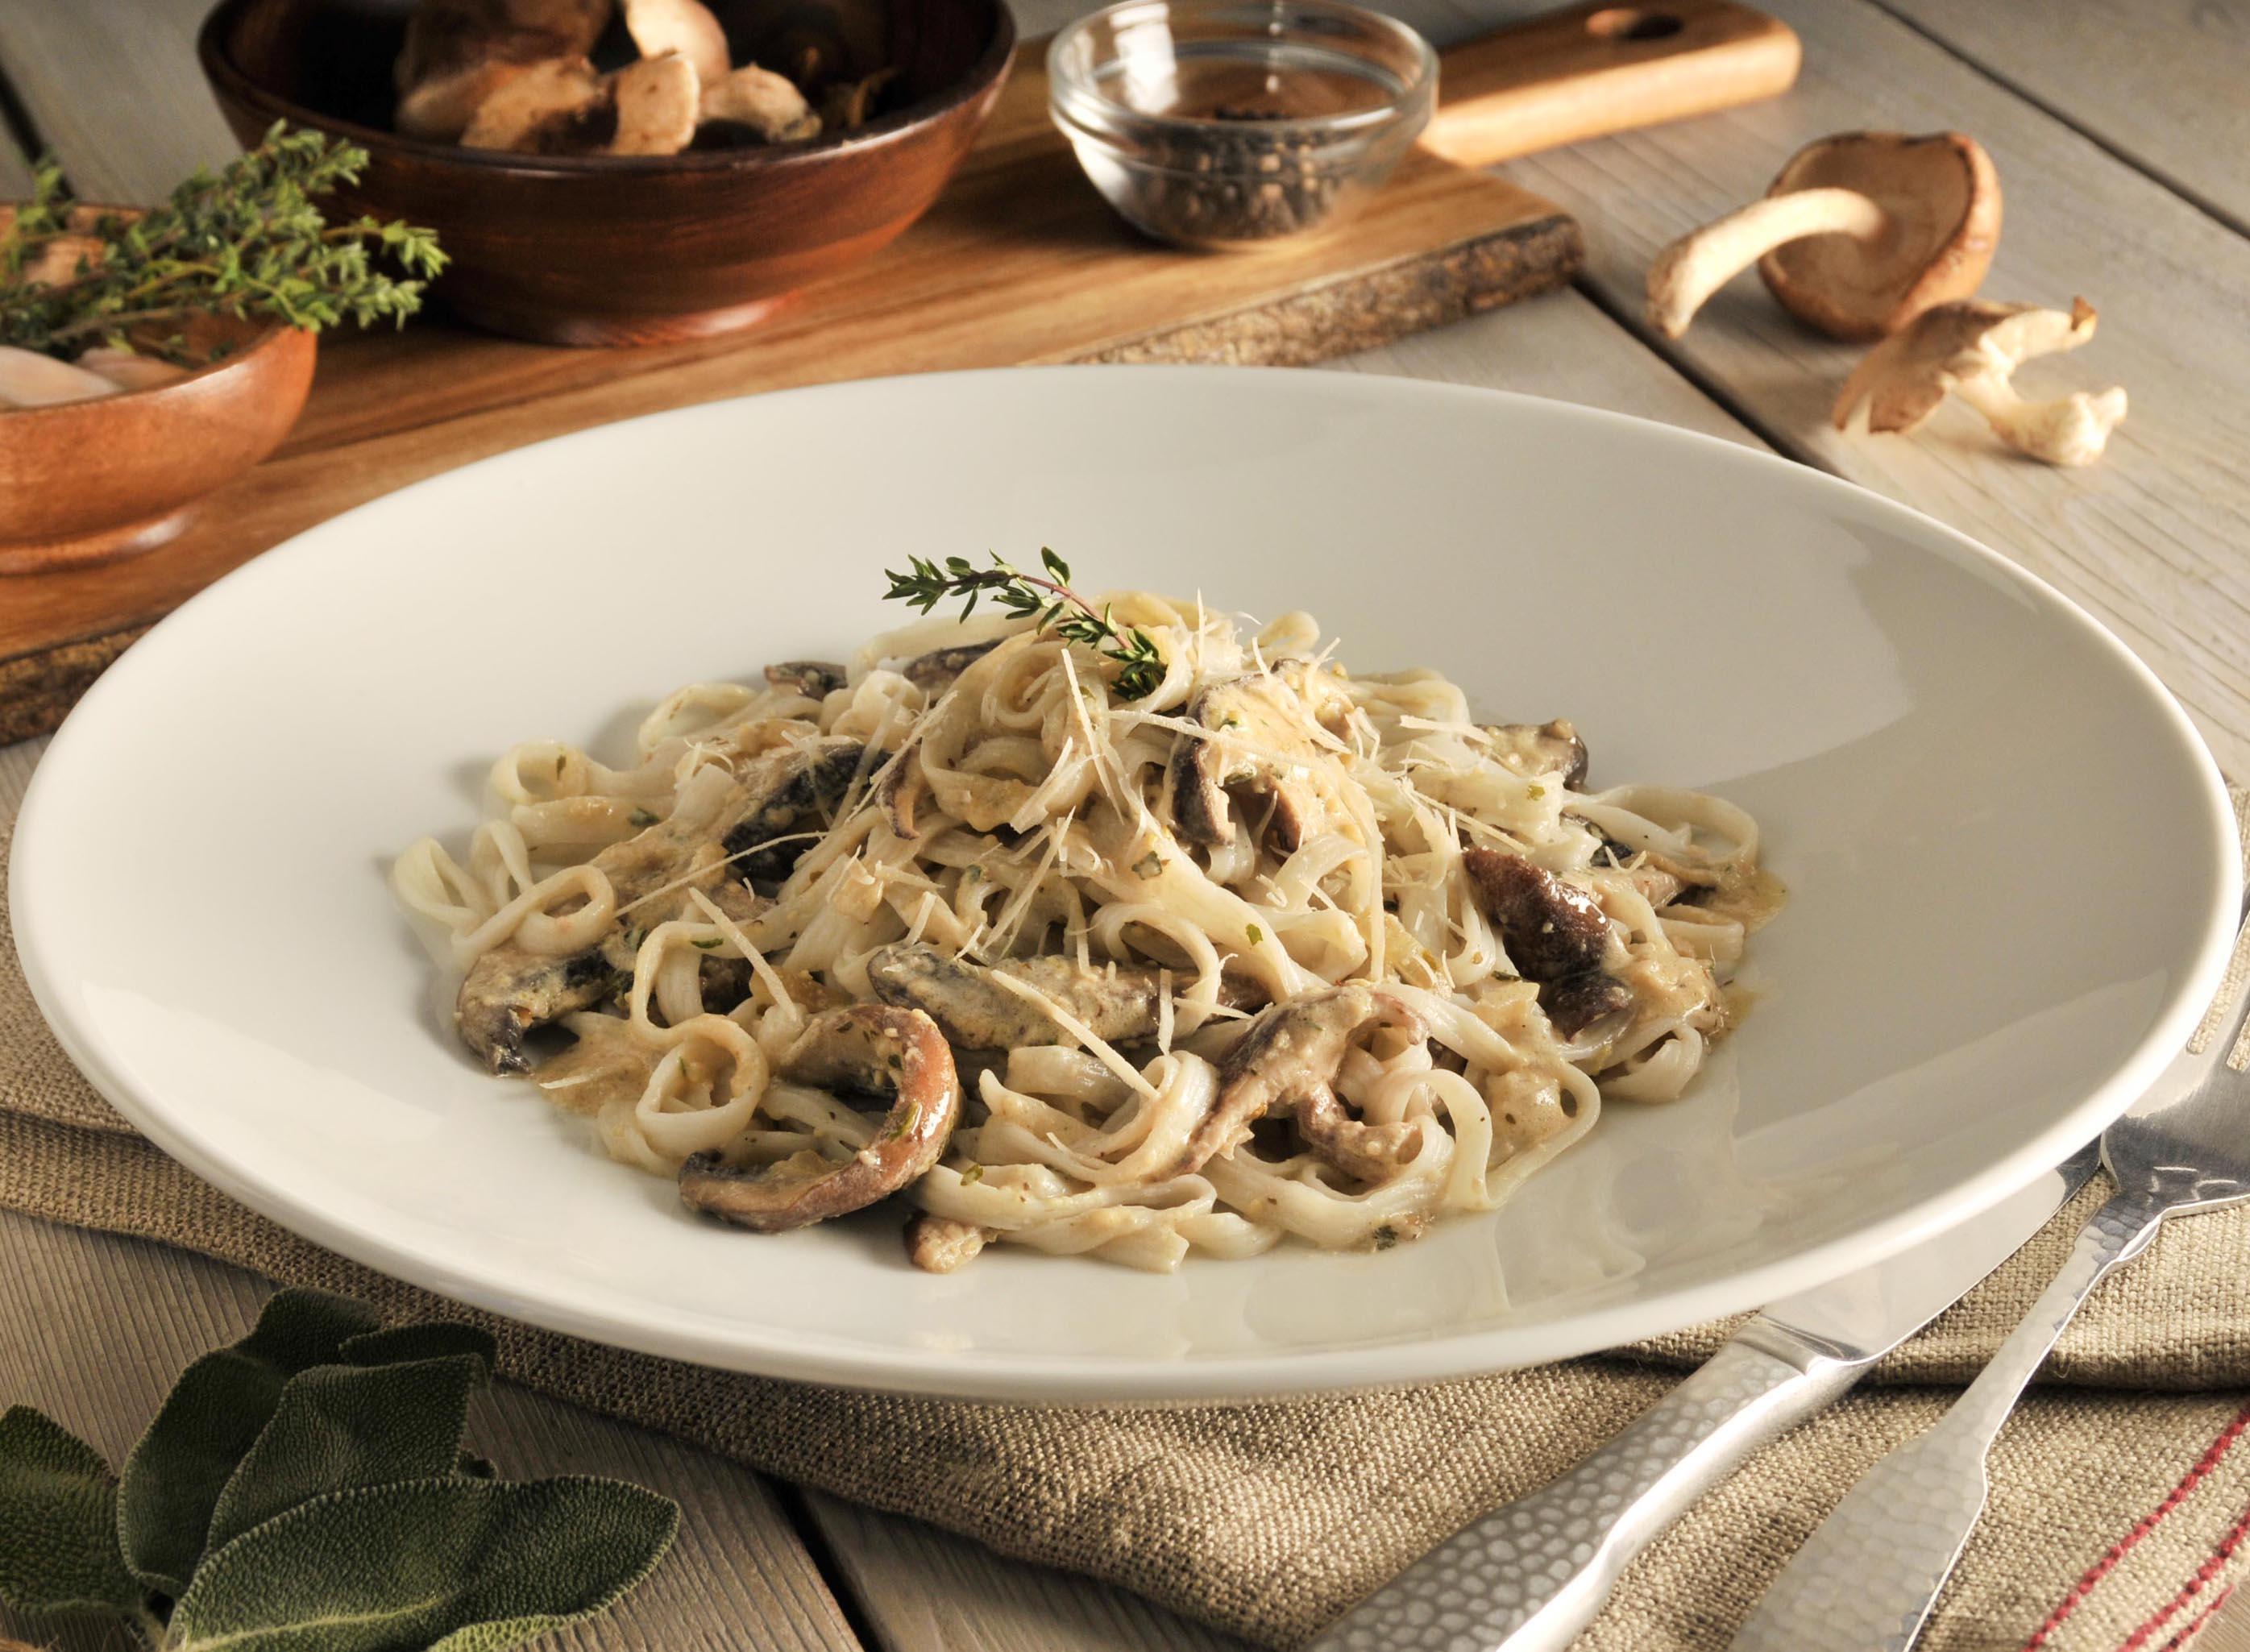 mushroom-fettuccine-recipe-nupasta-low-calorie-pasta